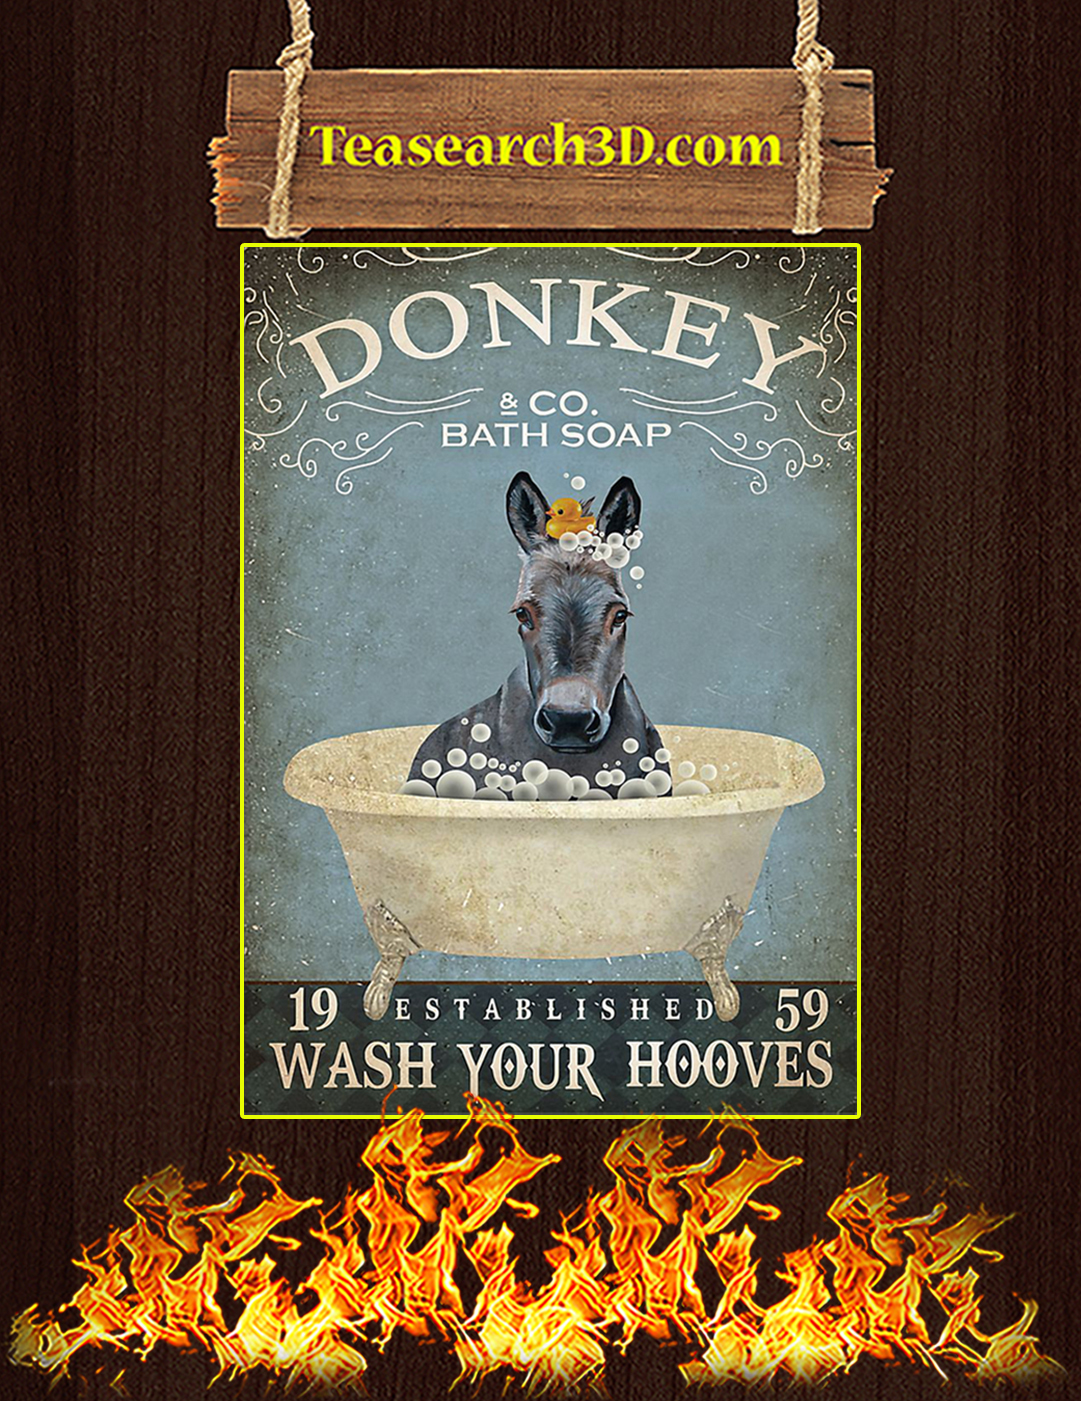 Bath soap company donkey poster A2